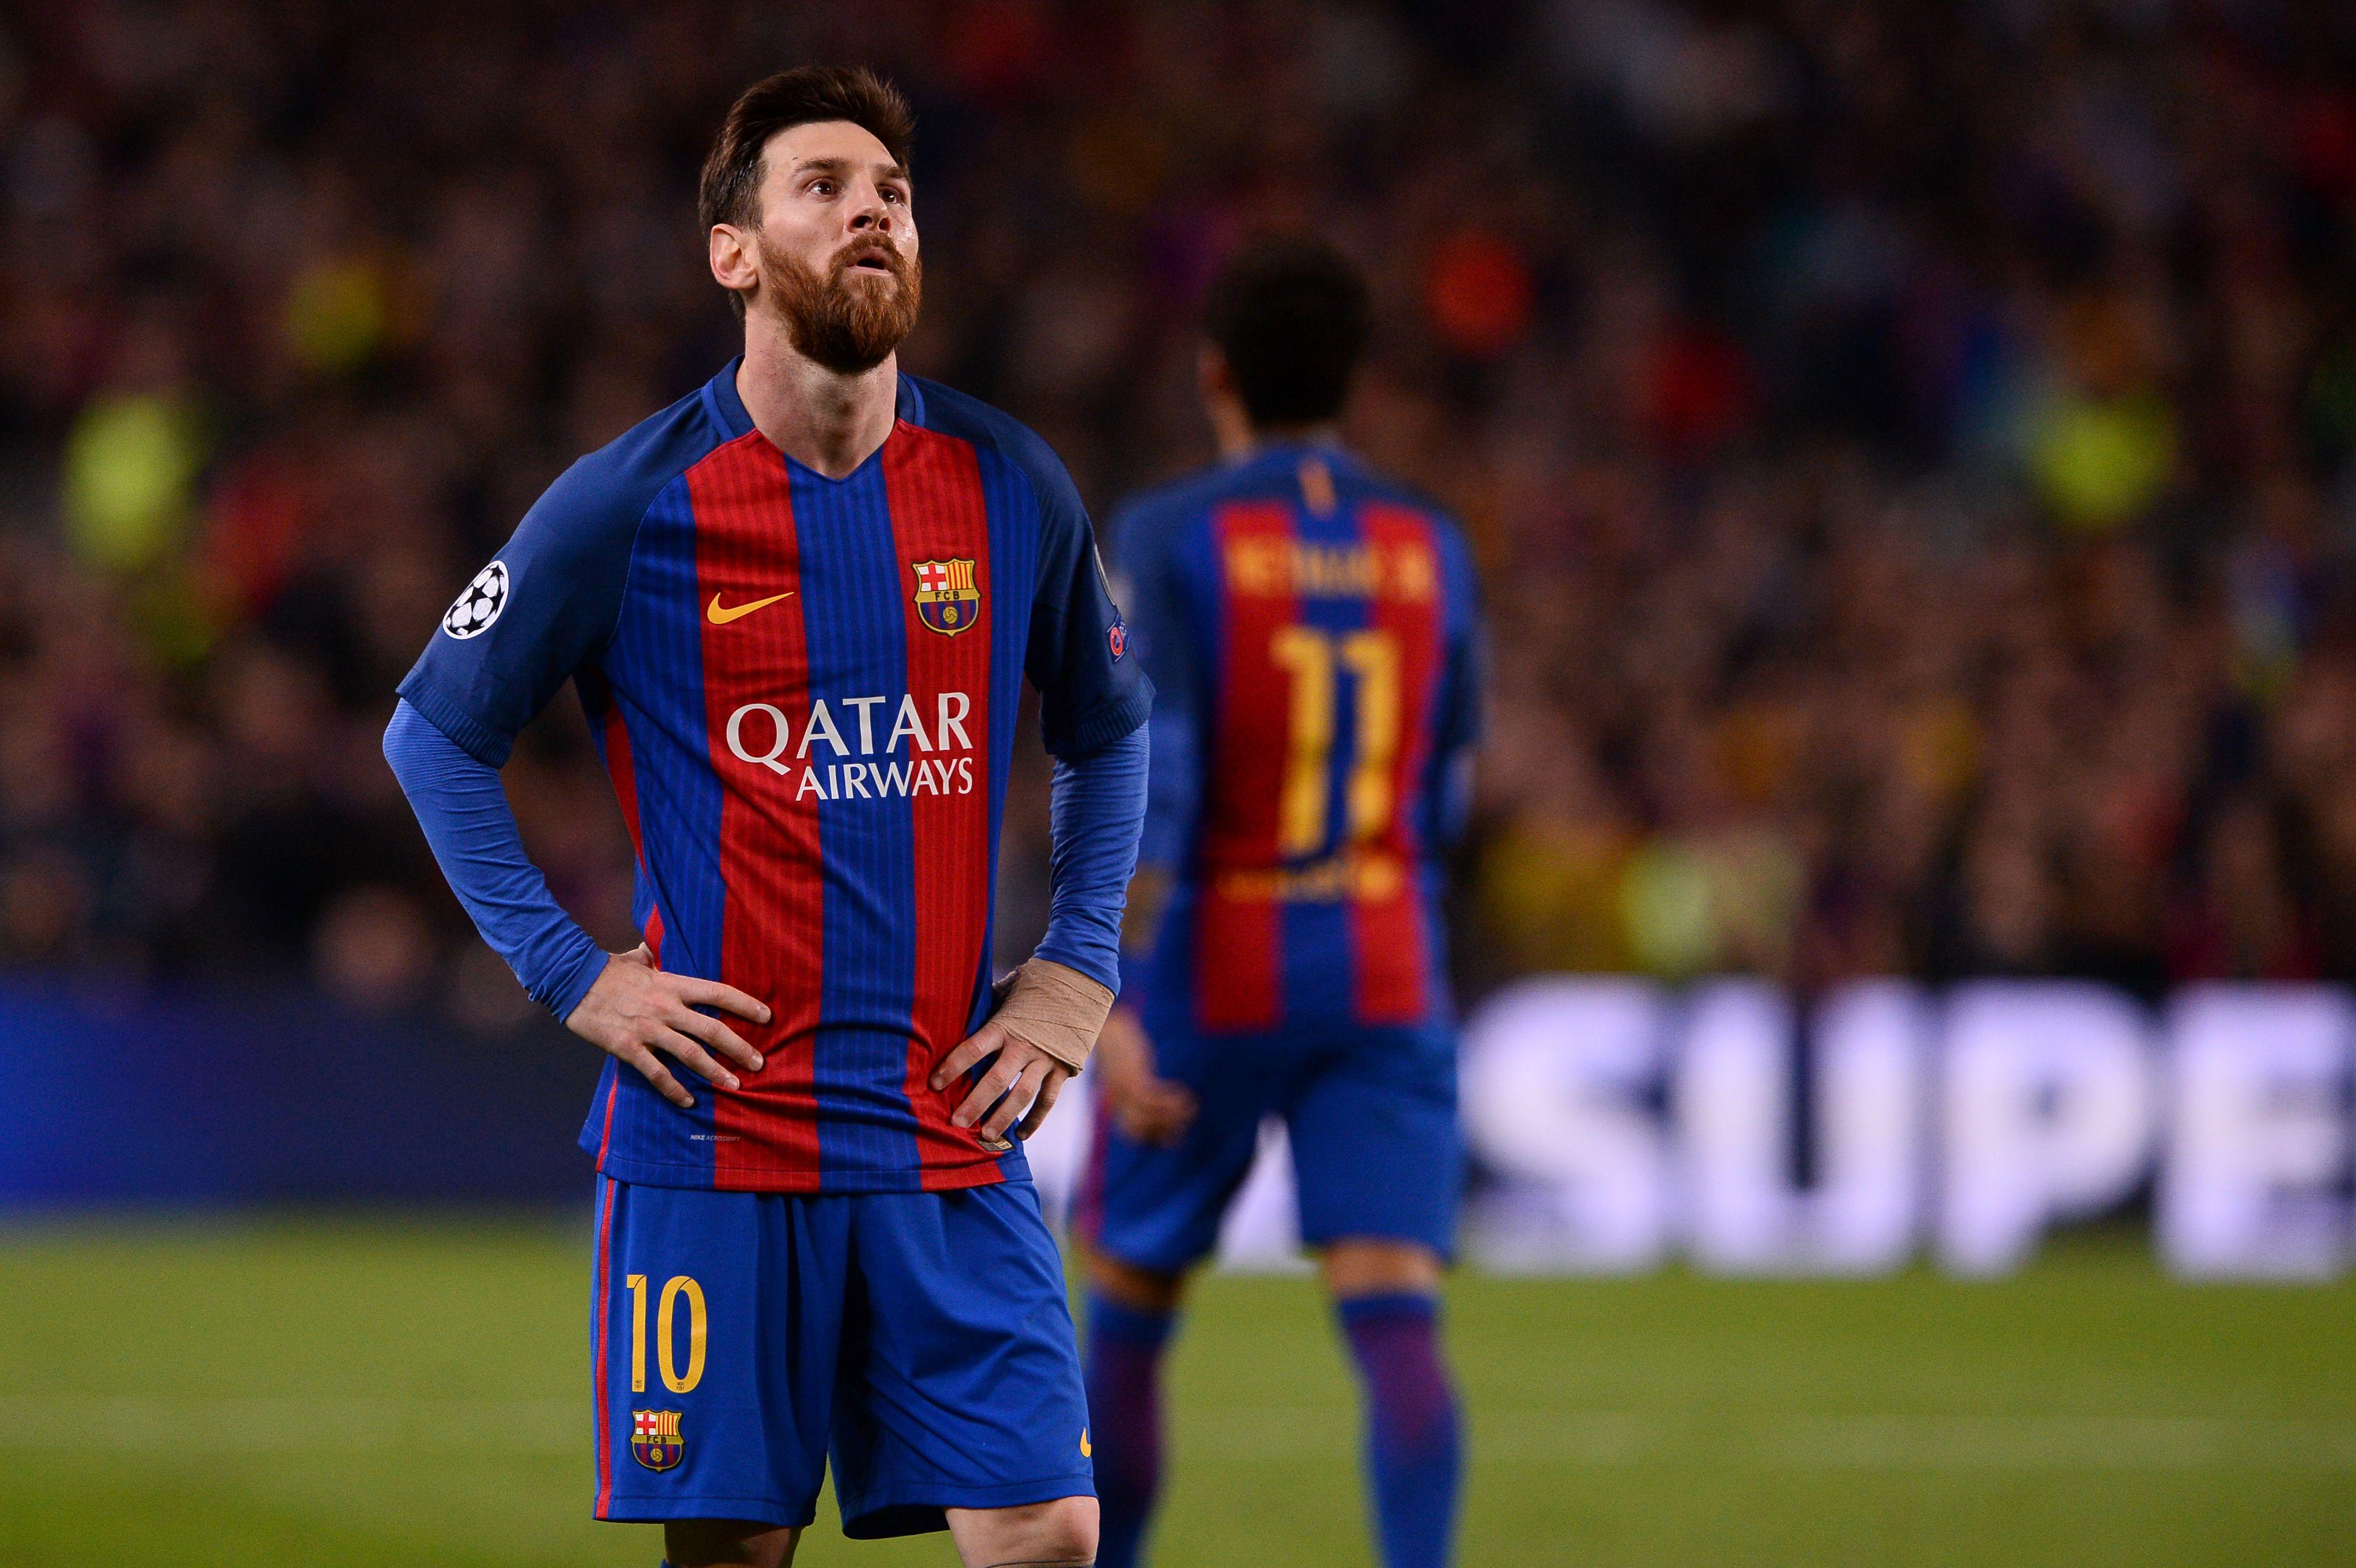 barcelona juventus live score, barcelona juventus highlights, barcelona score, barcelona juventus score, barcelona goal,